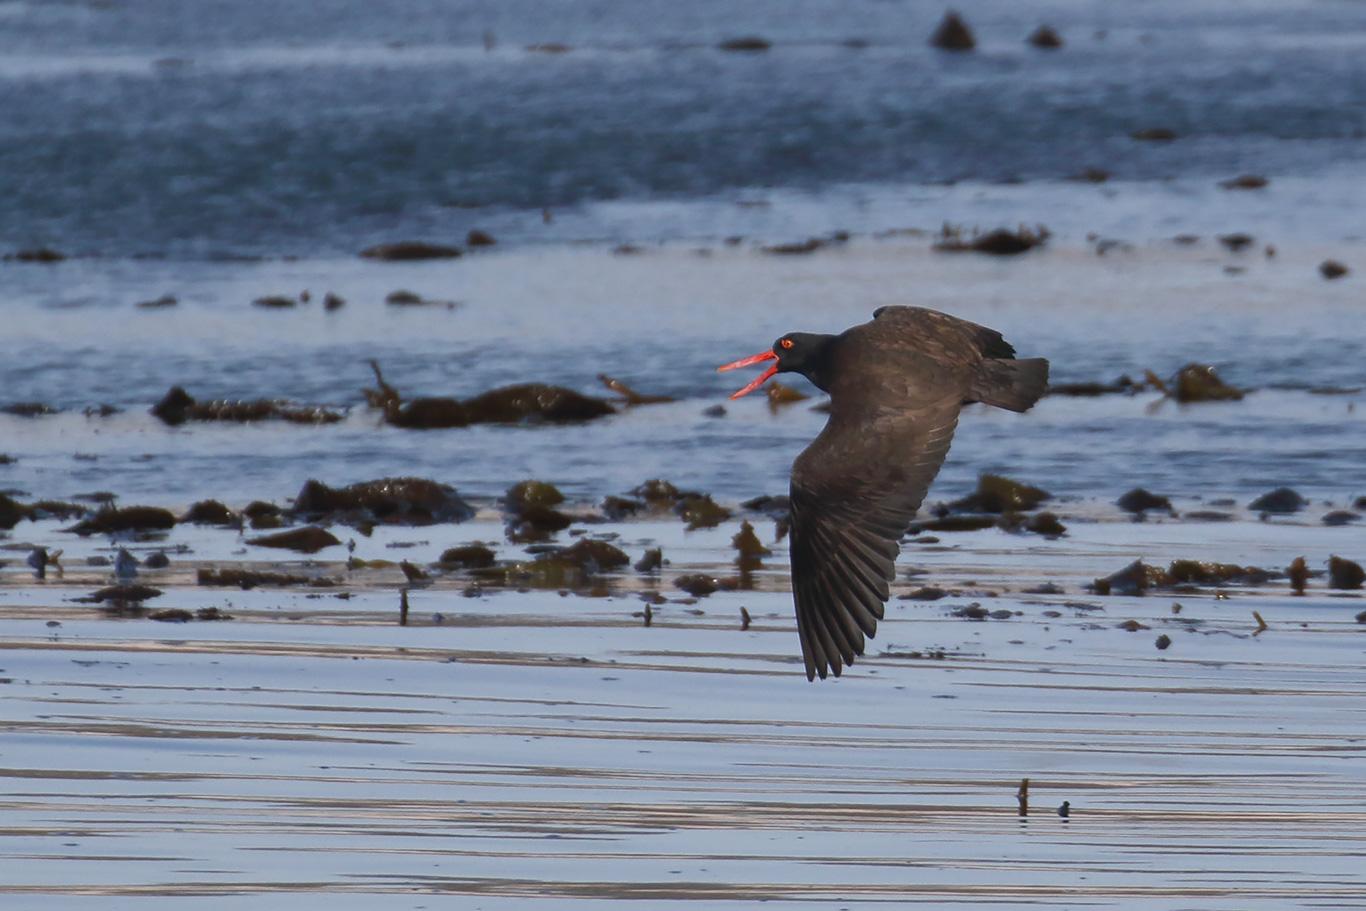 Blackish Oystercatcher, Kidney Island, Falkland Islands.